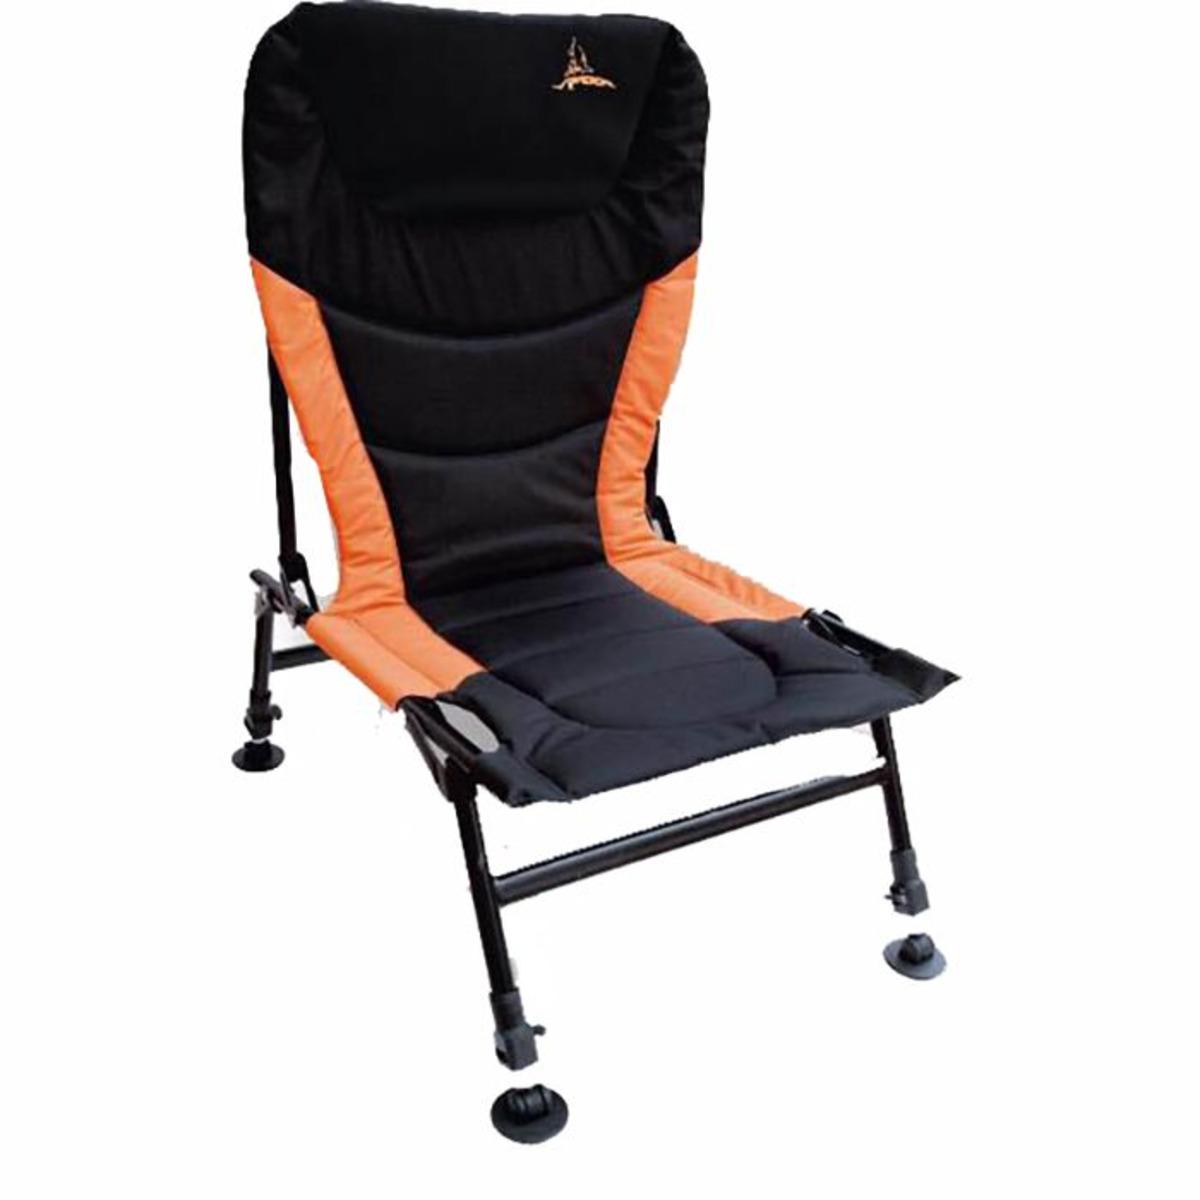 Radical Warchild Chair - 62x48x84 cm